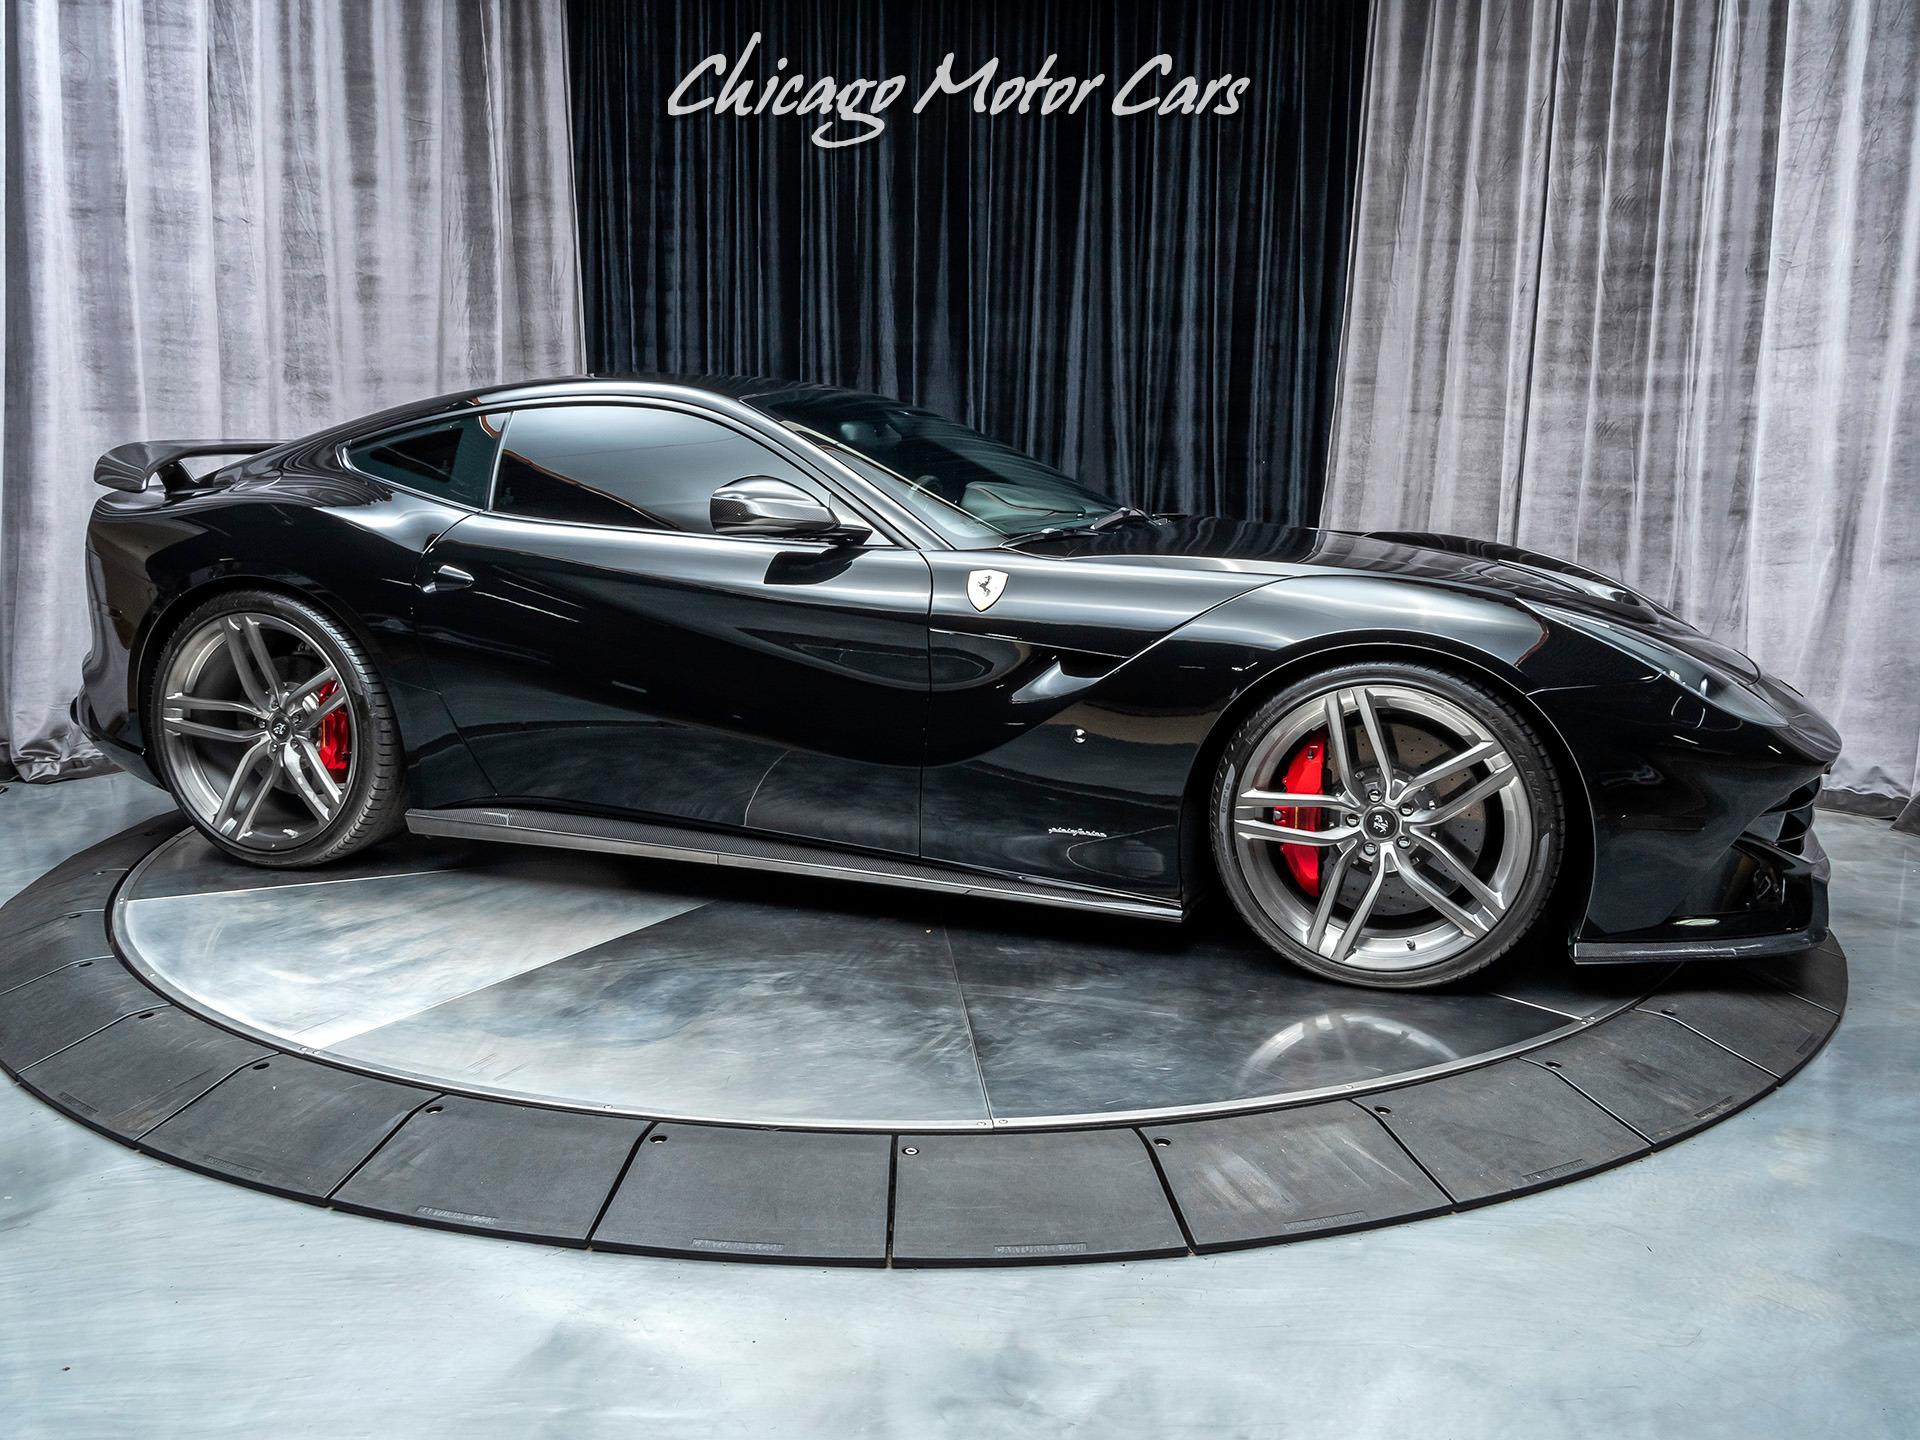 Used-2014-Ferrari-F12-Berlinetta-Coupe-NOVITEC-Upgrades-Carbon-Fiber